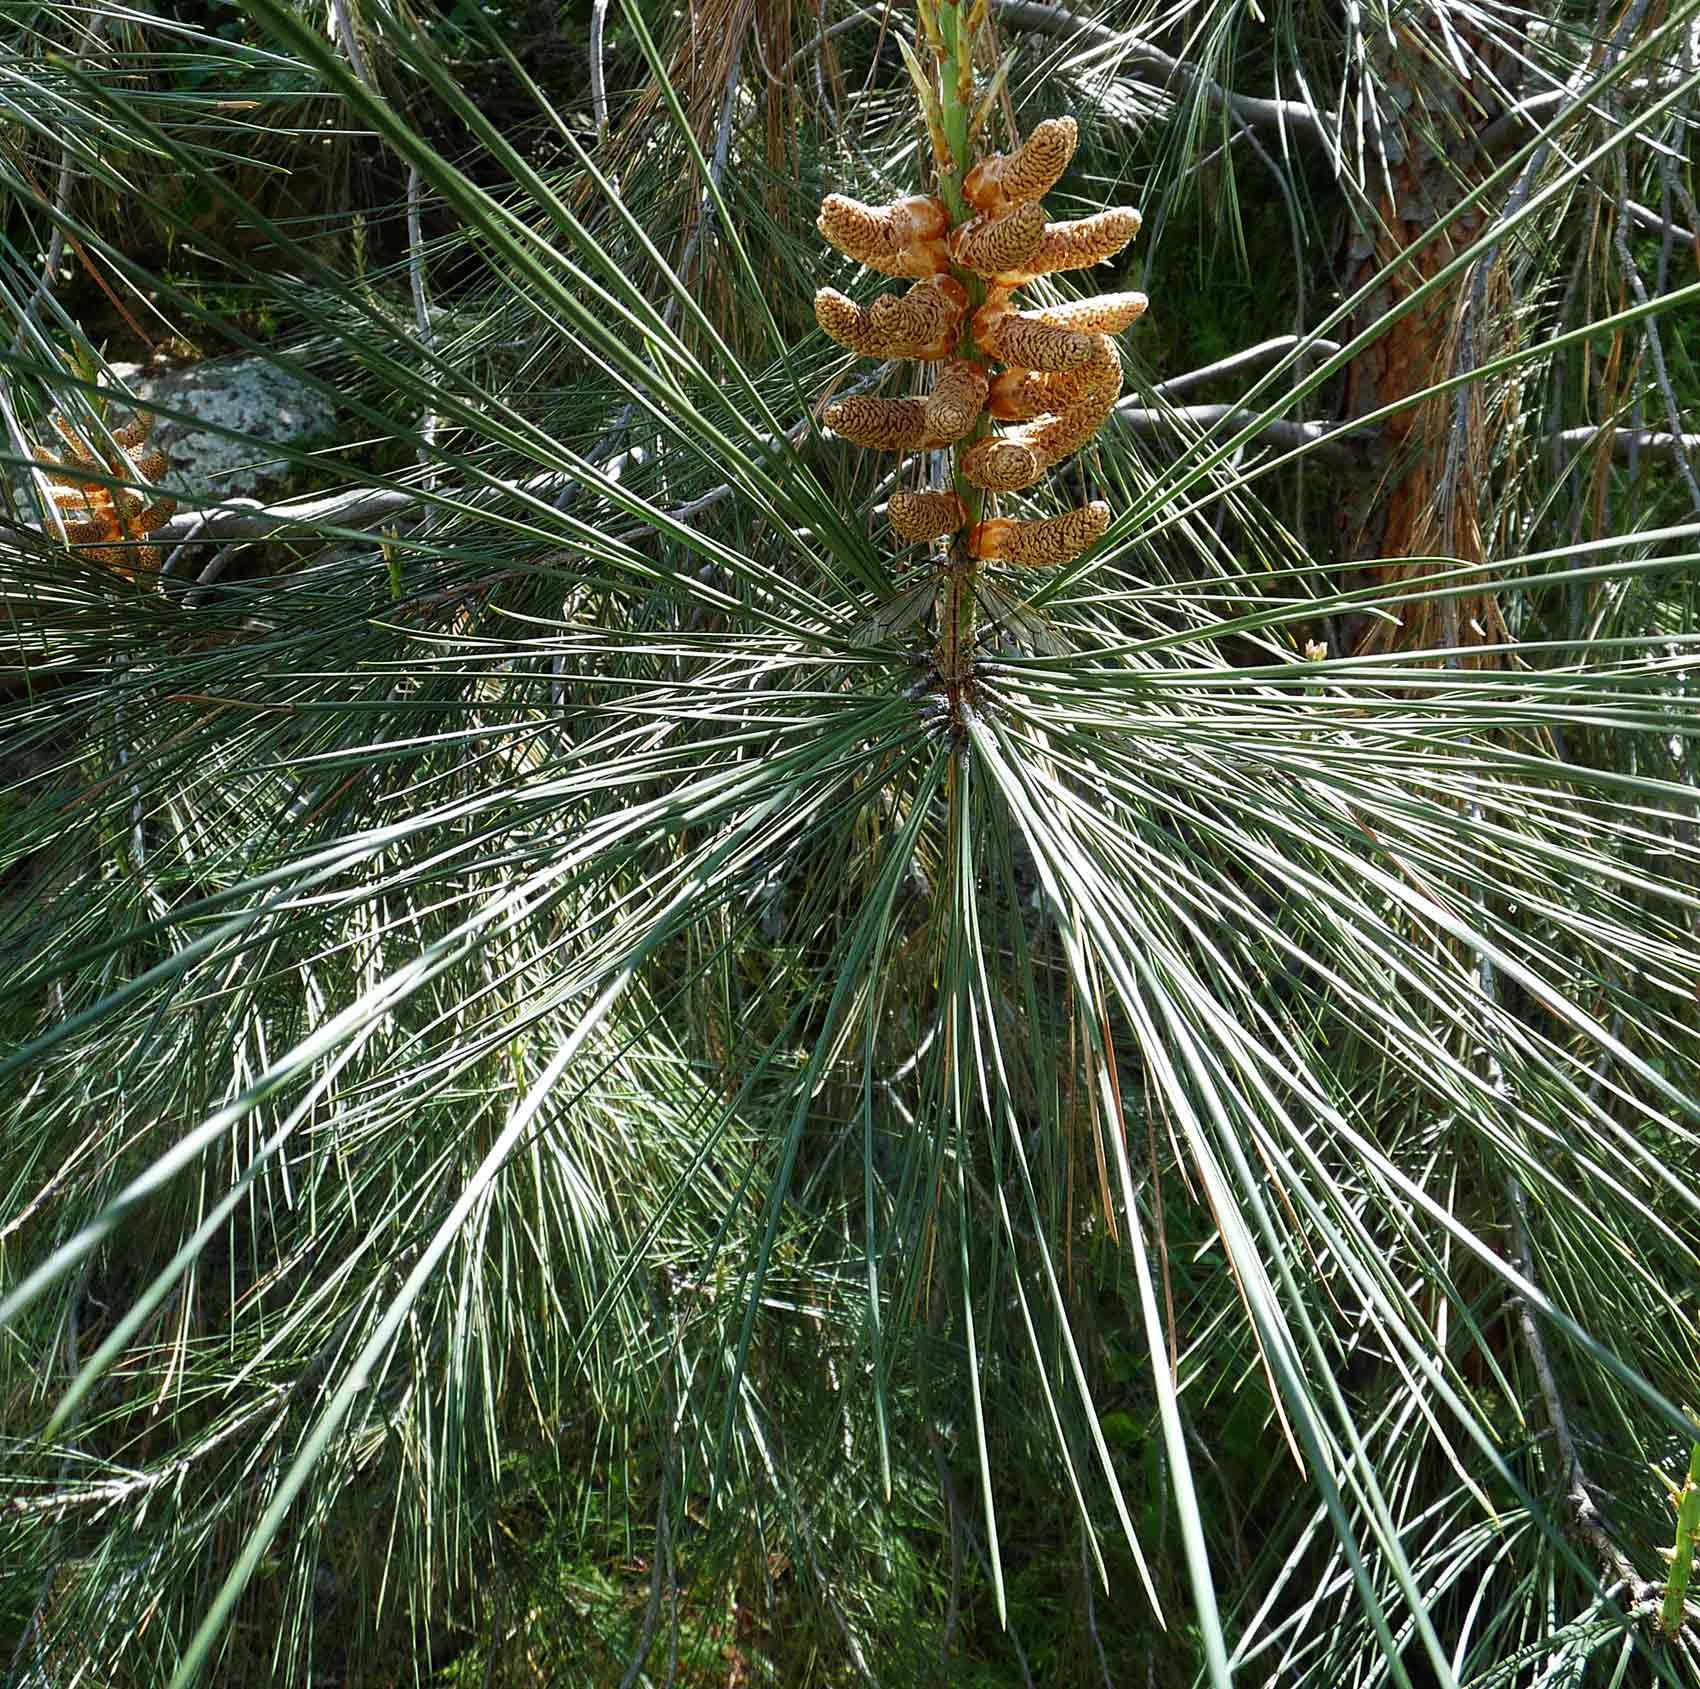 Western White Pine Needles